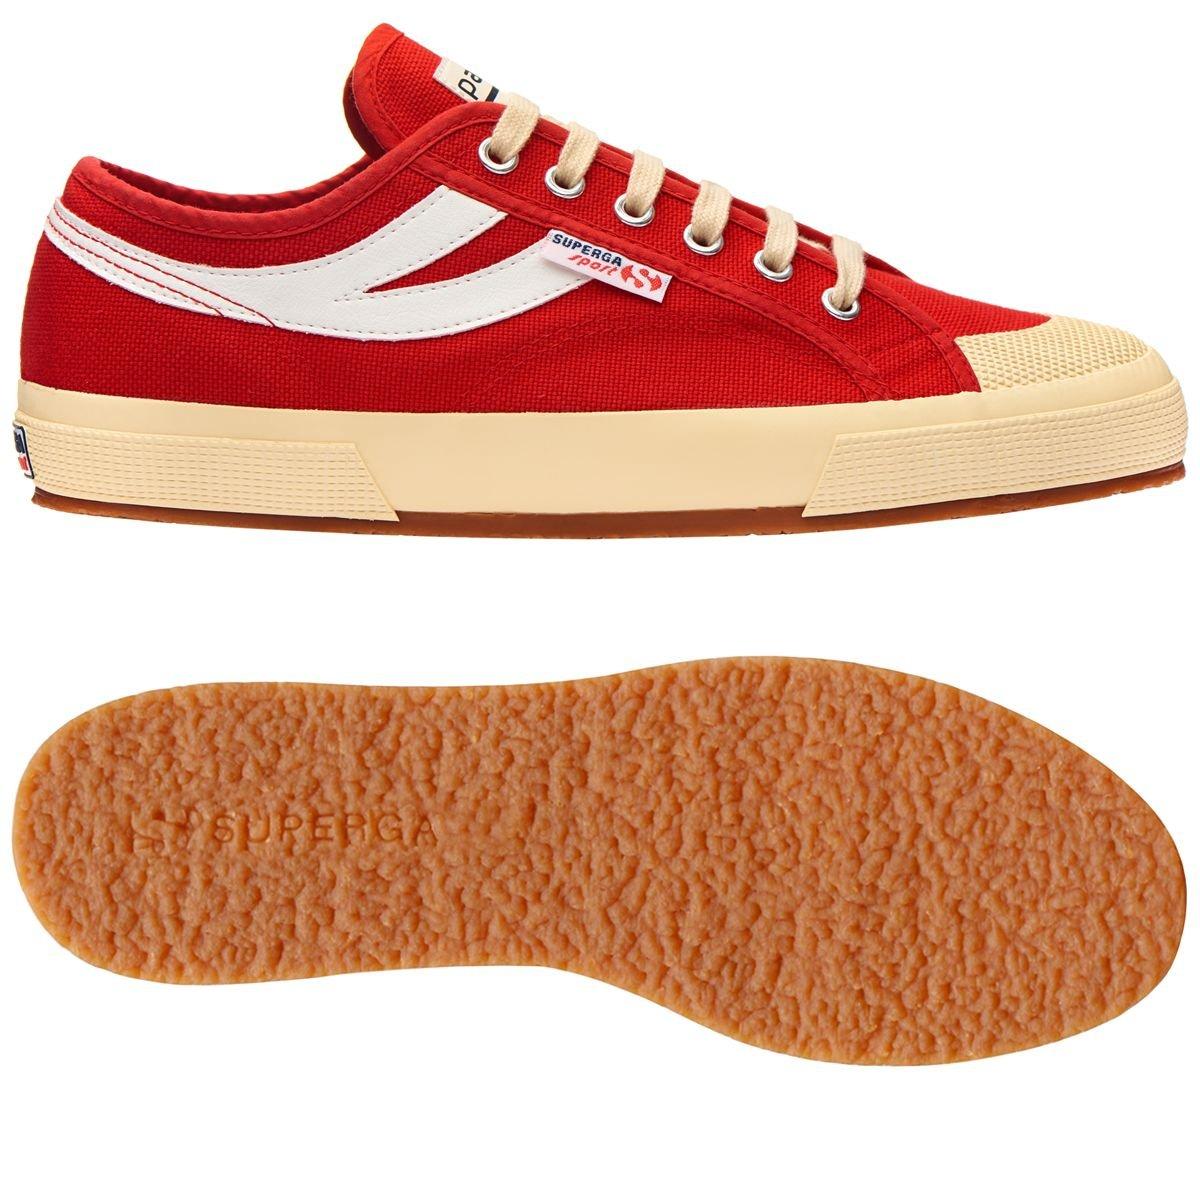 Superga 2750 Cotu Panatta, scarpe scarpe scarpe da ginnastica Unisex – Adulto | Qualità In Primo Luogo  | Maschio/Ragazze Scarpa  b6ce85